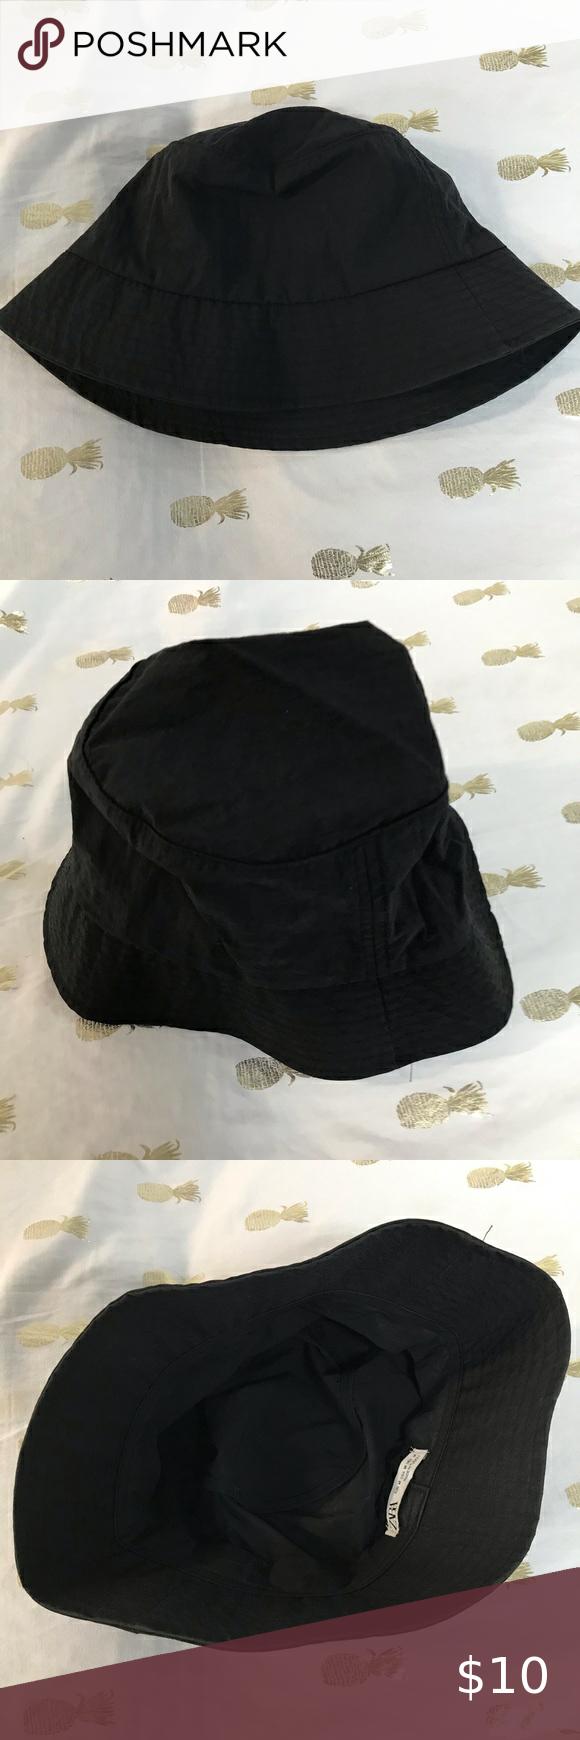 Bucket Hat Zara Hats Fitted Hats Black Fedora